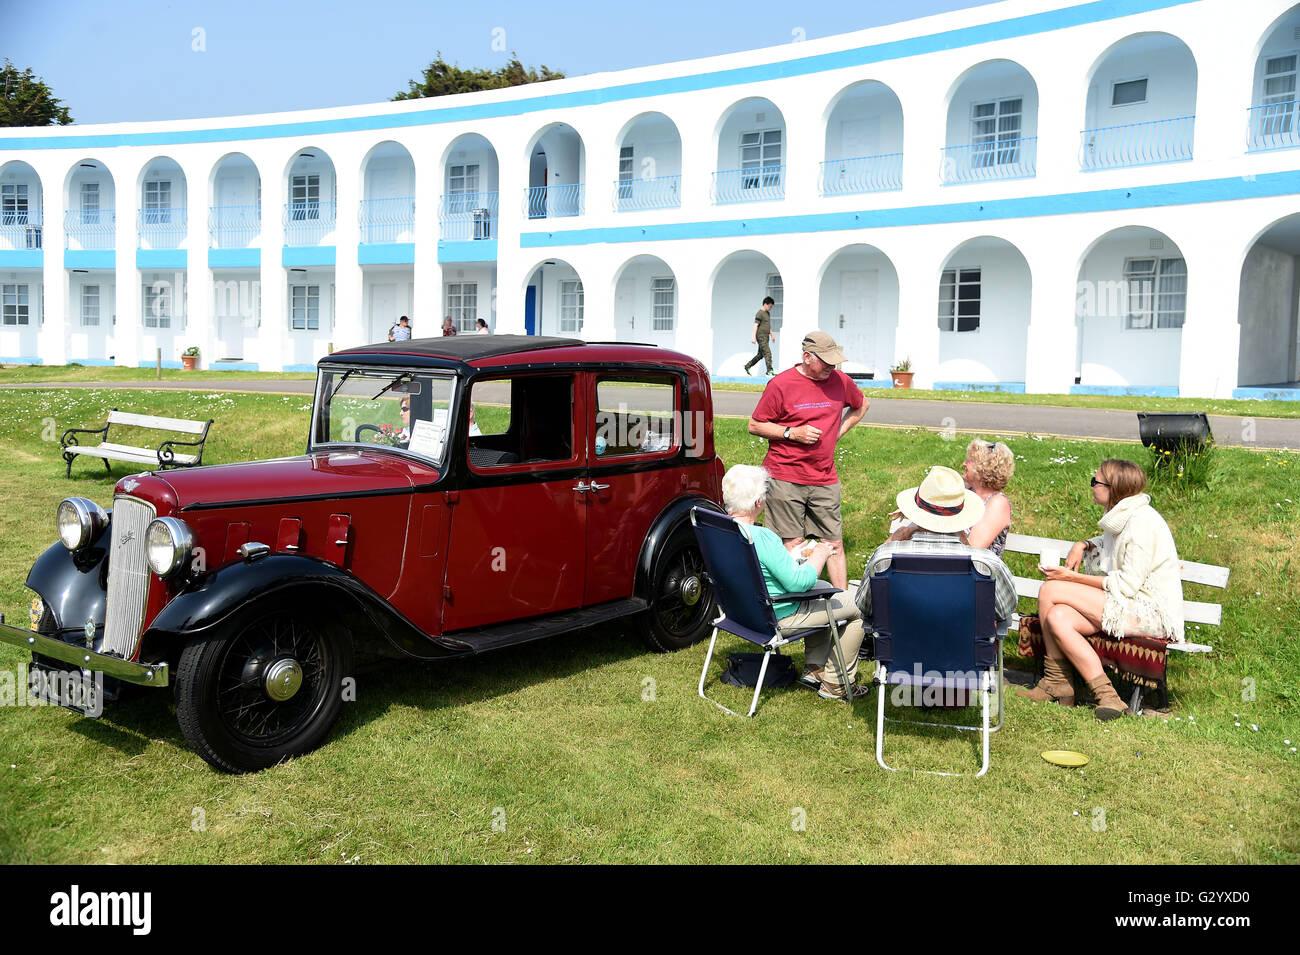 Weymouth, Dorset, UK. 05th June, 2016. Austin classic car. The Hardy ...